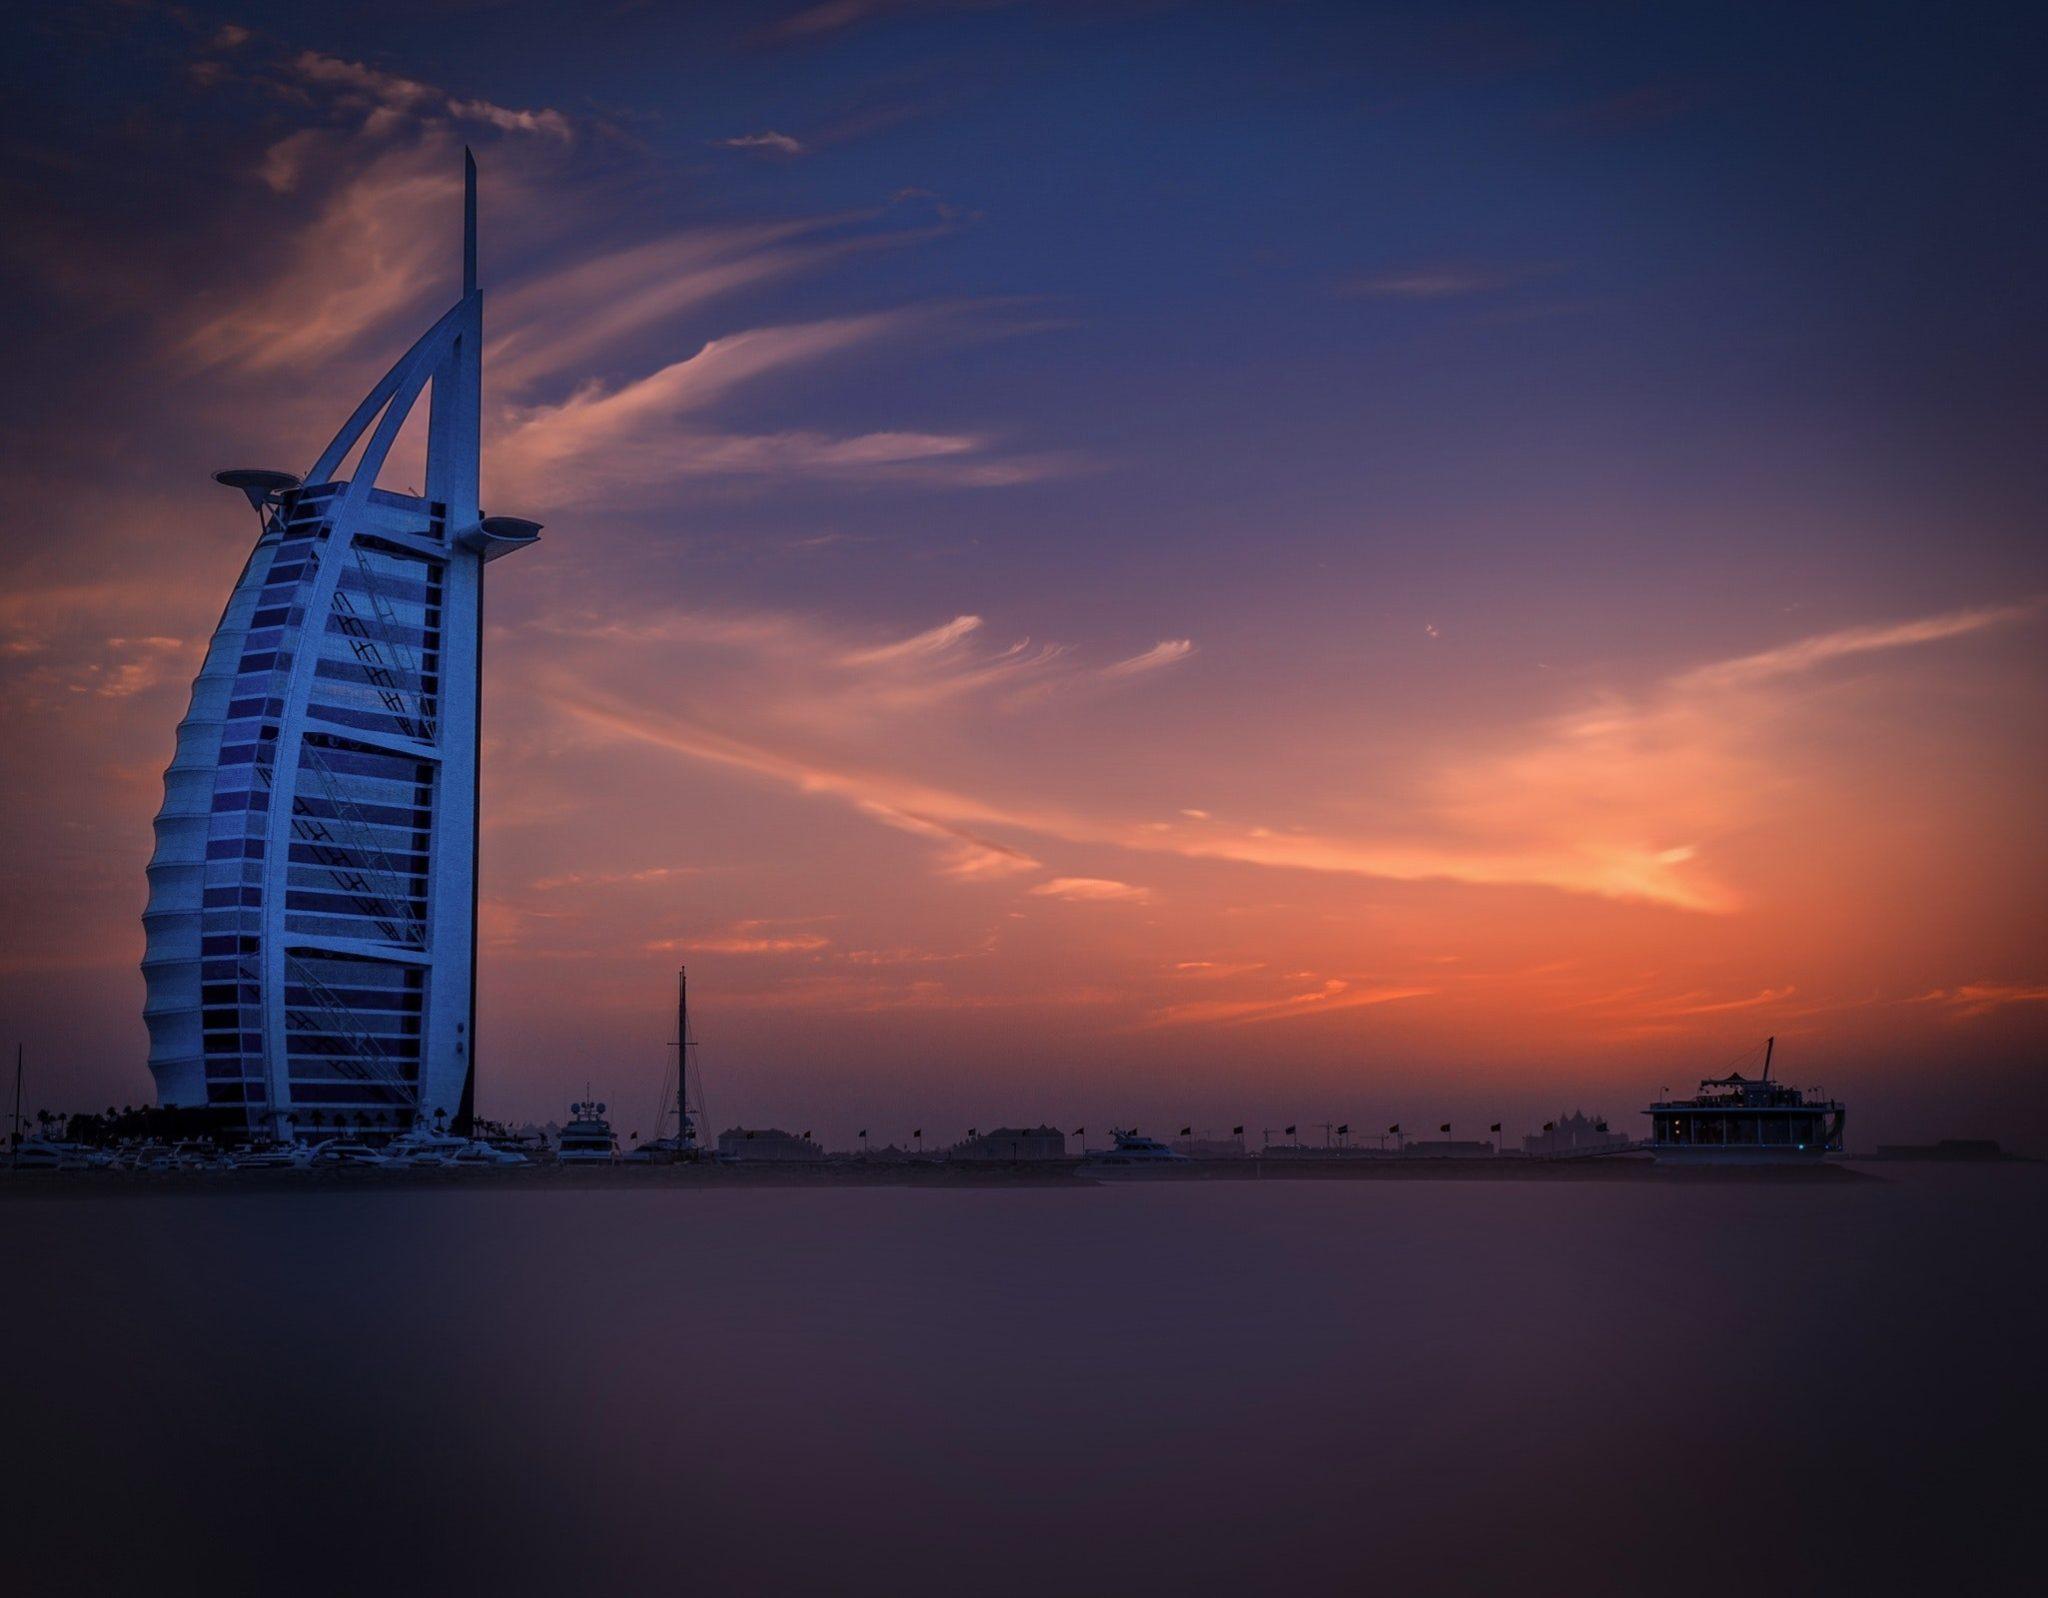 flights to Australia - Top layover destinations Dubai